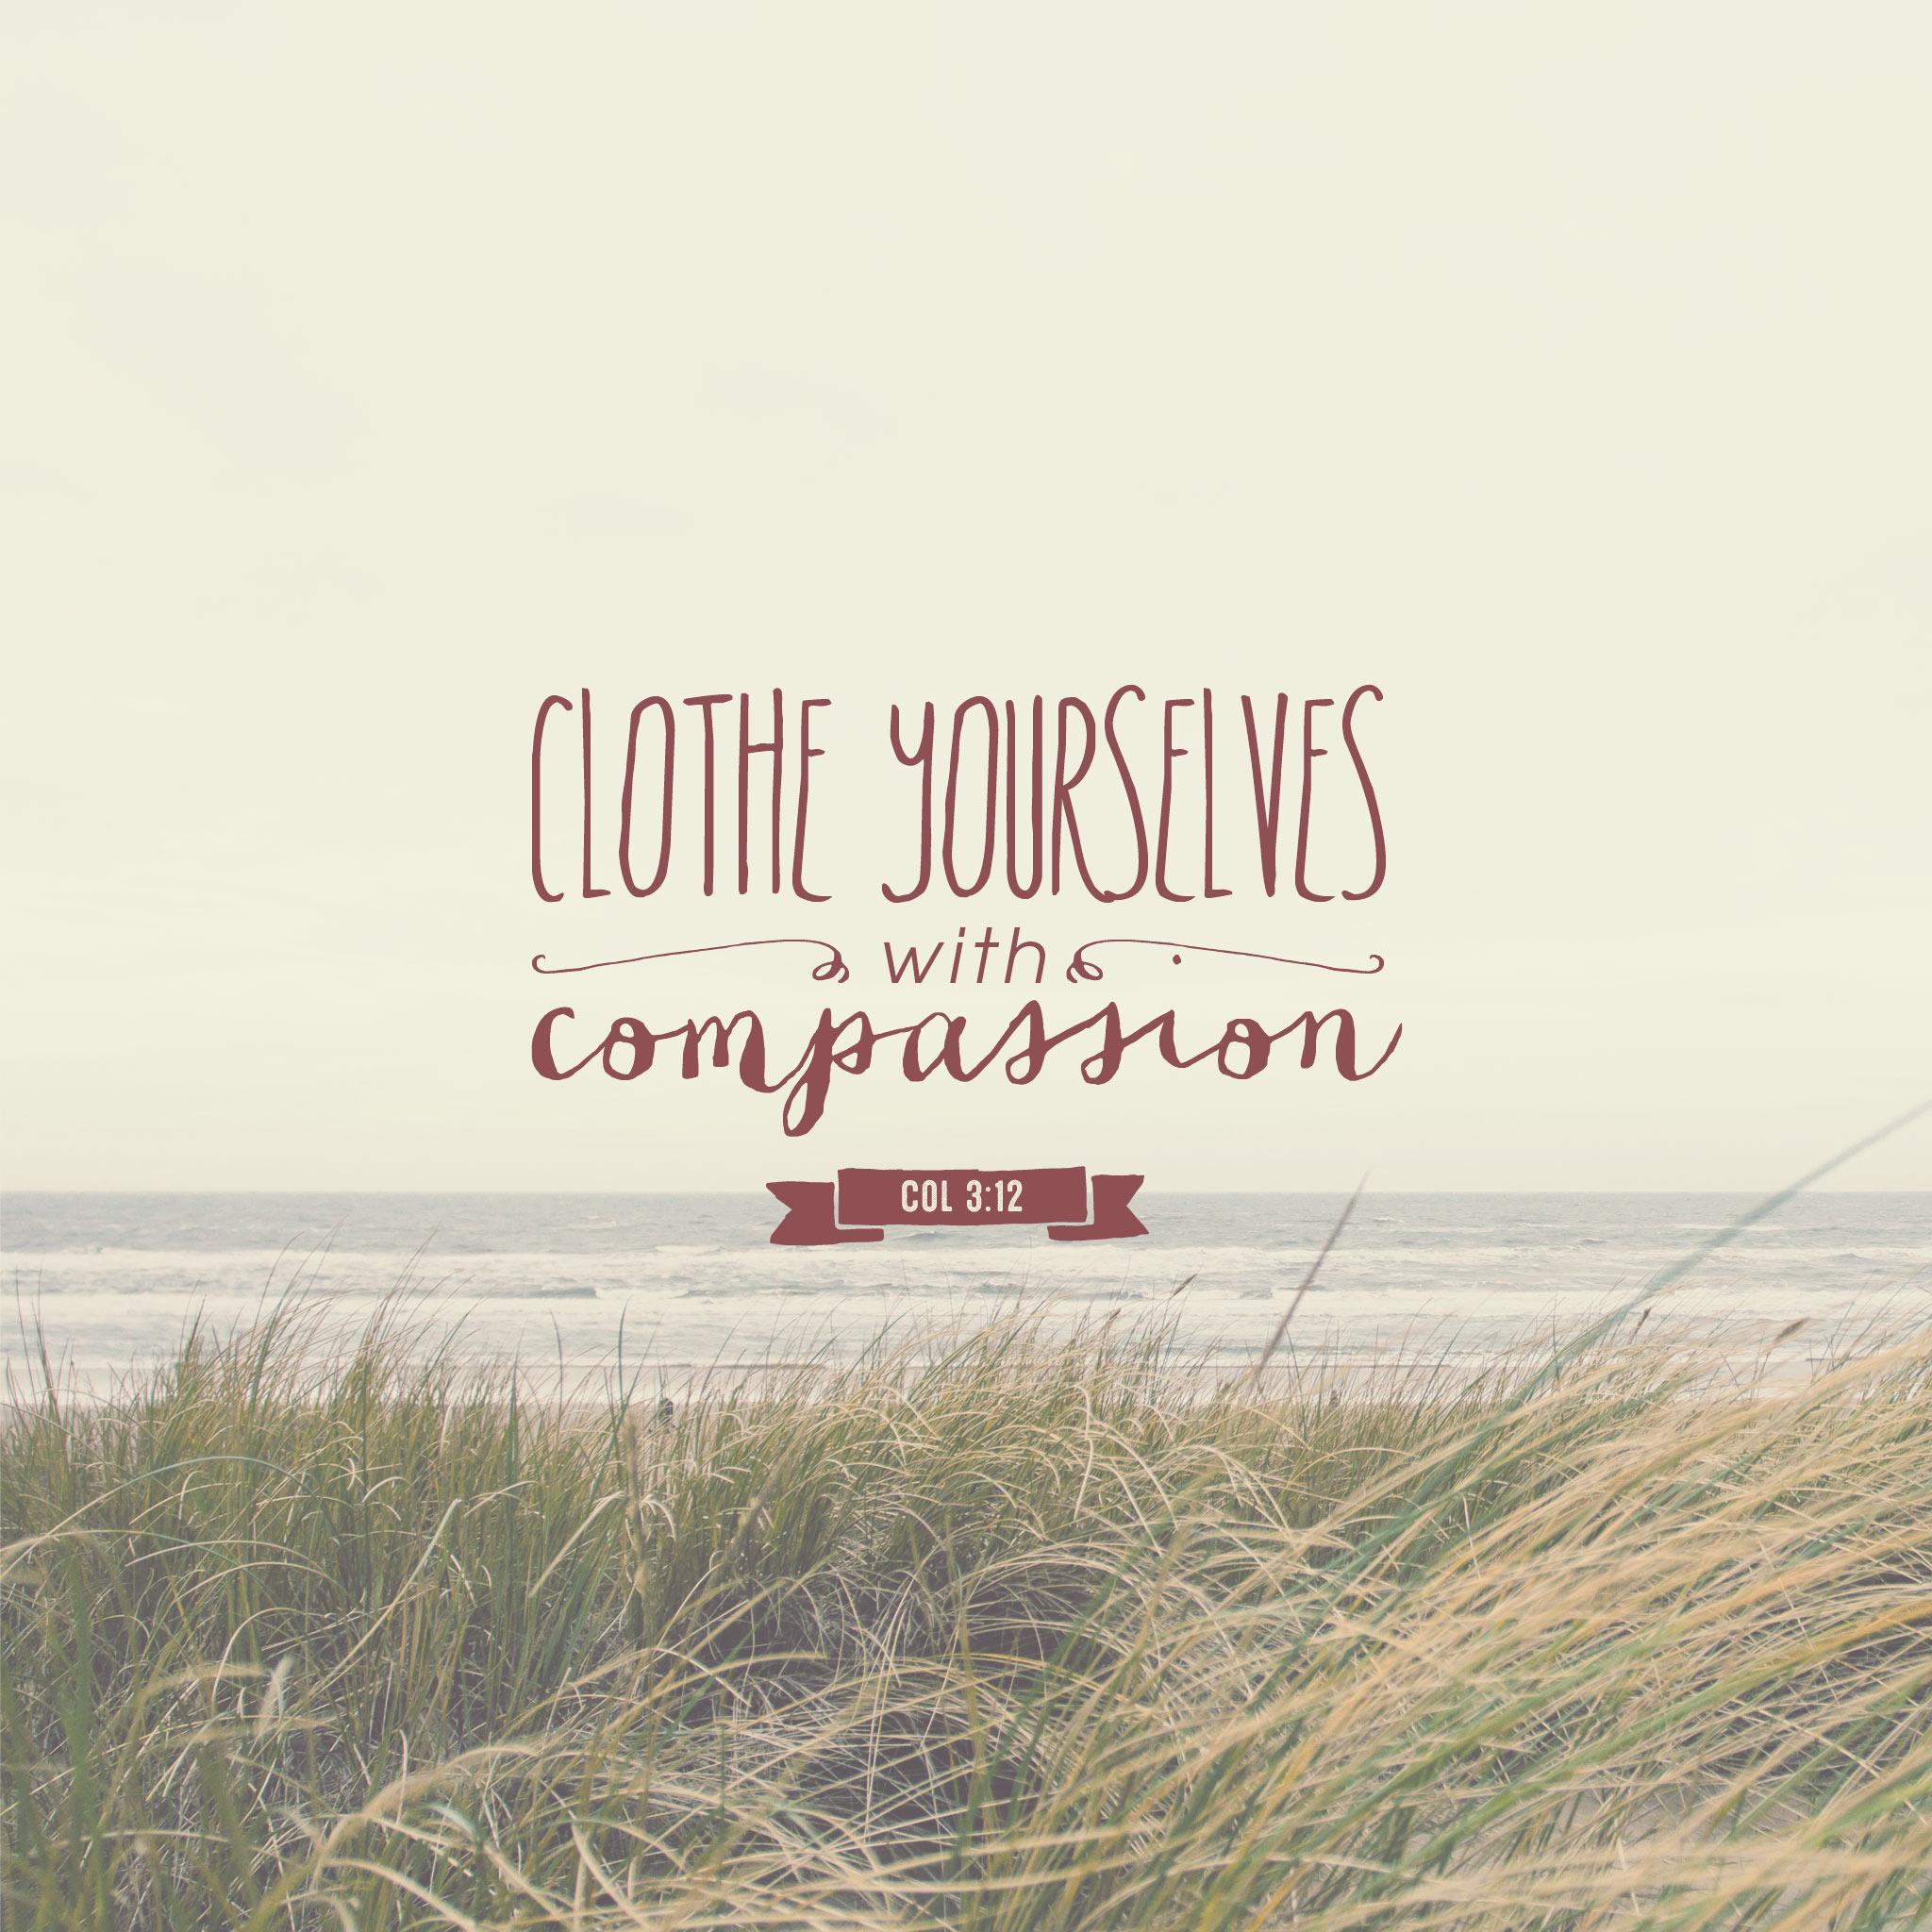 Compassion & Kindness